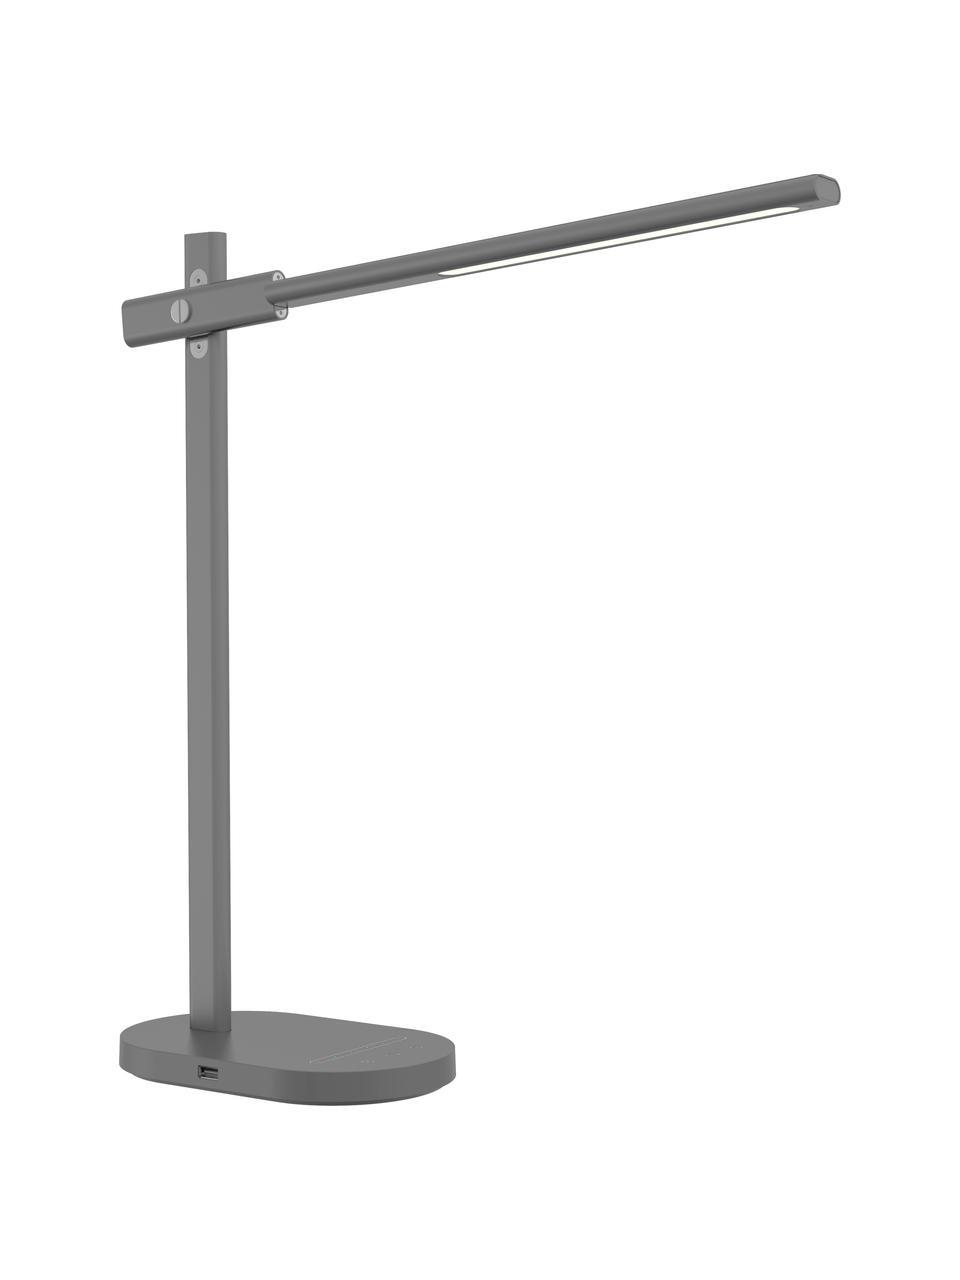 Dimmbare LED-Schreibtischlampe Office mit Touch-Funktion, Lampenfuß: Aluminium, beschichtet, Grau, 20 x 48 cm